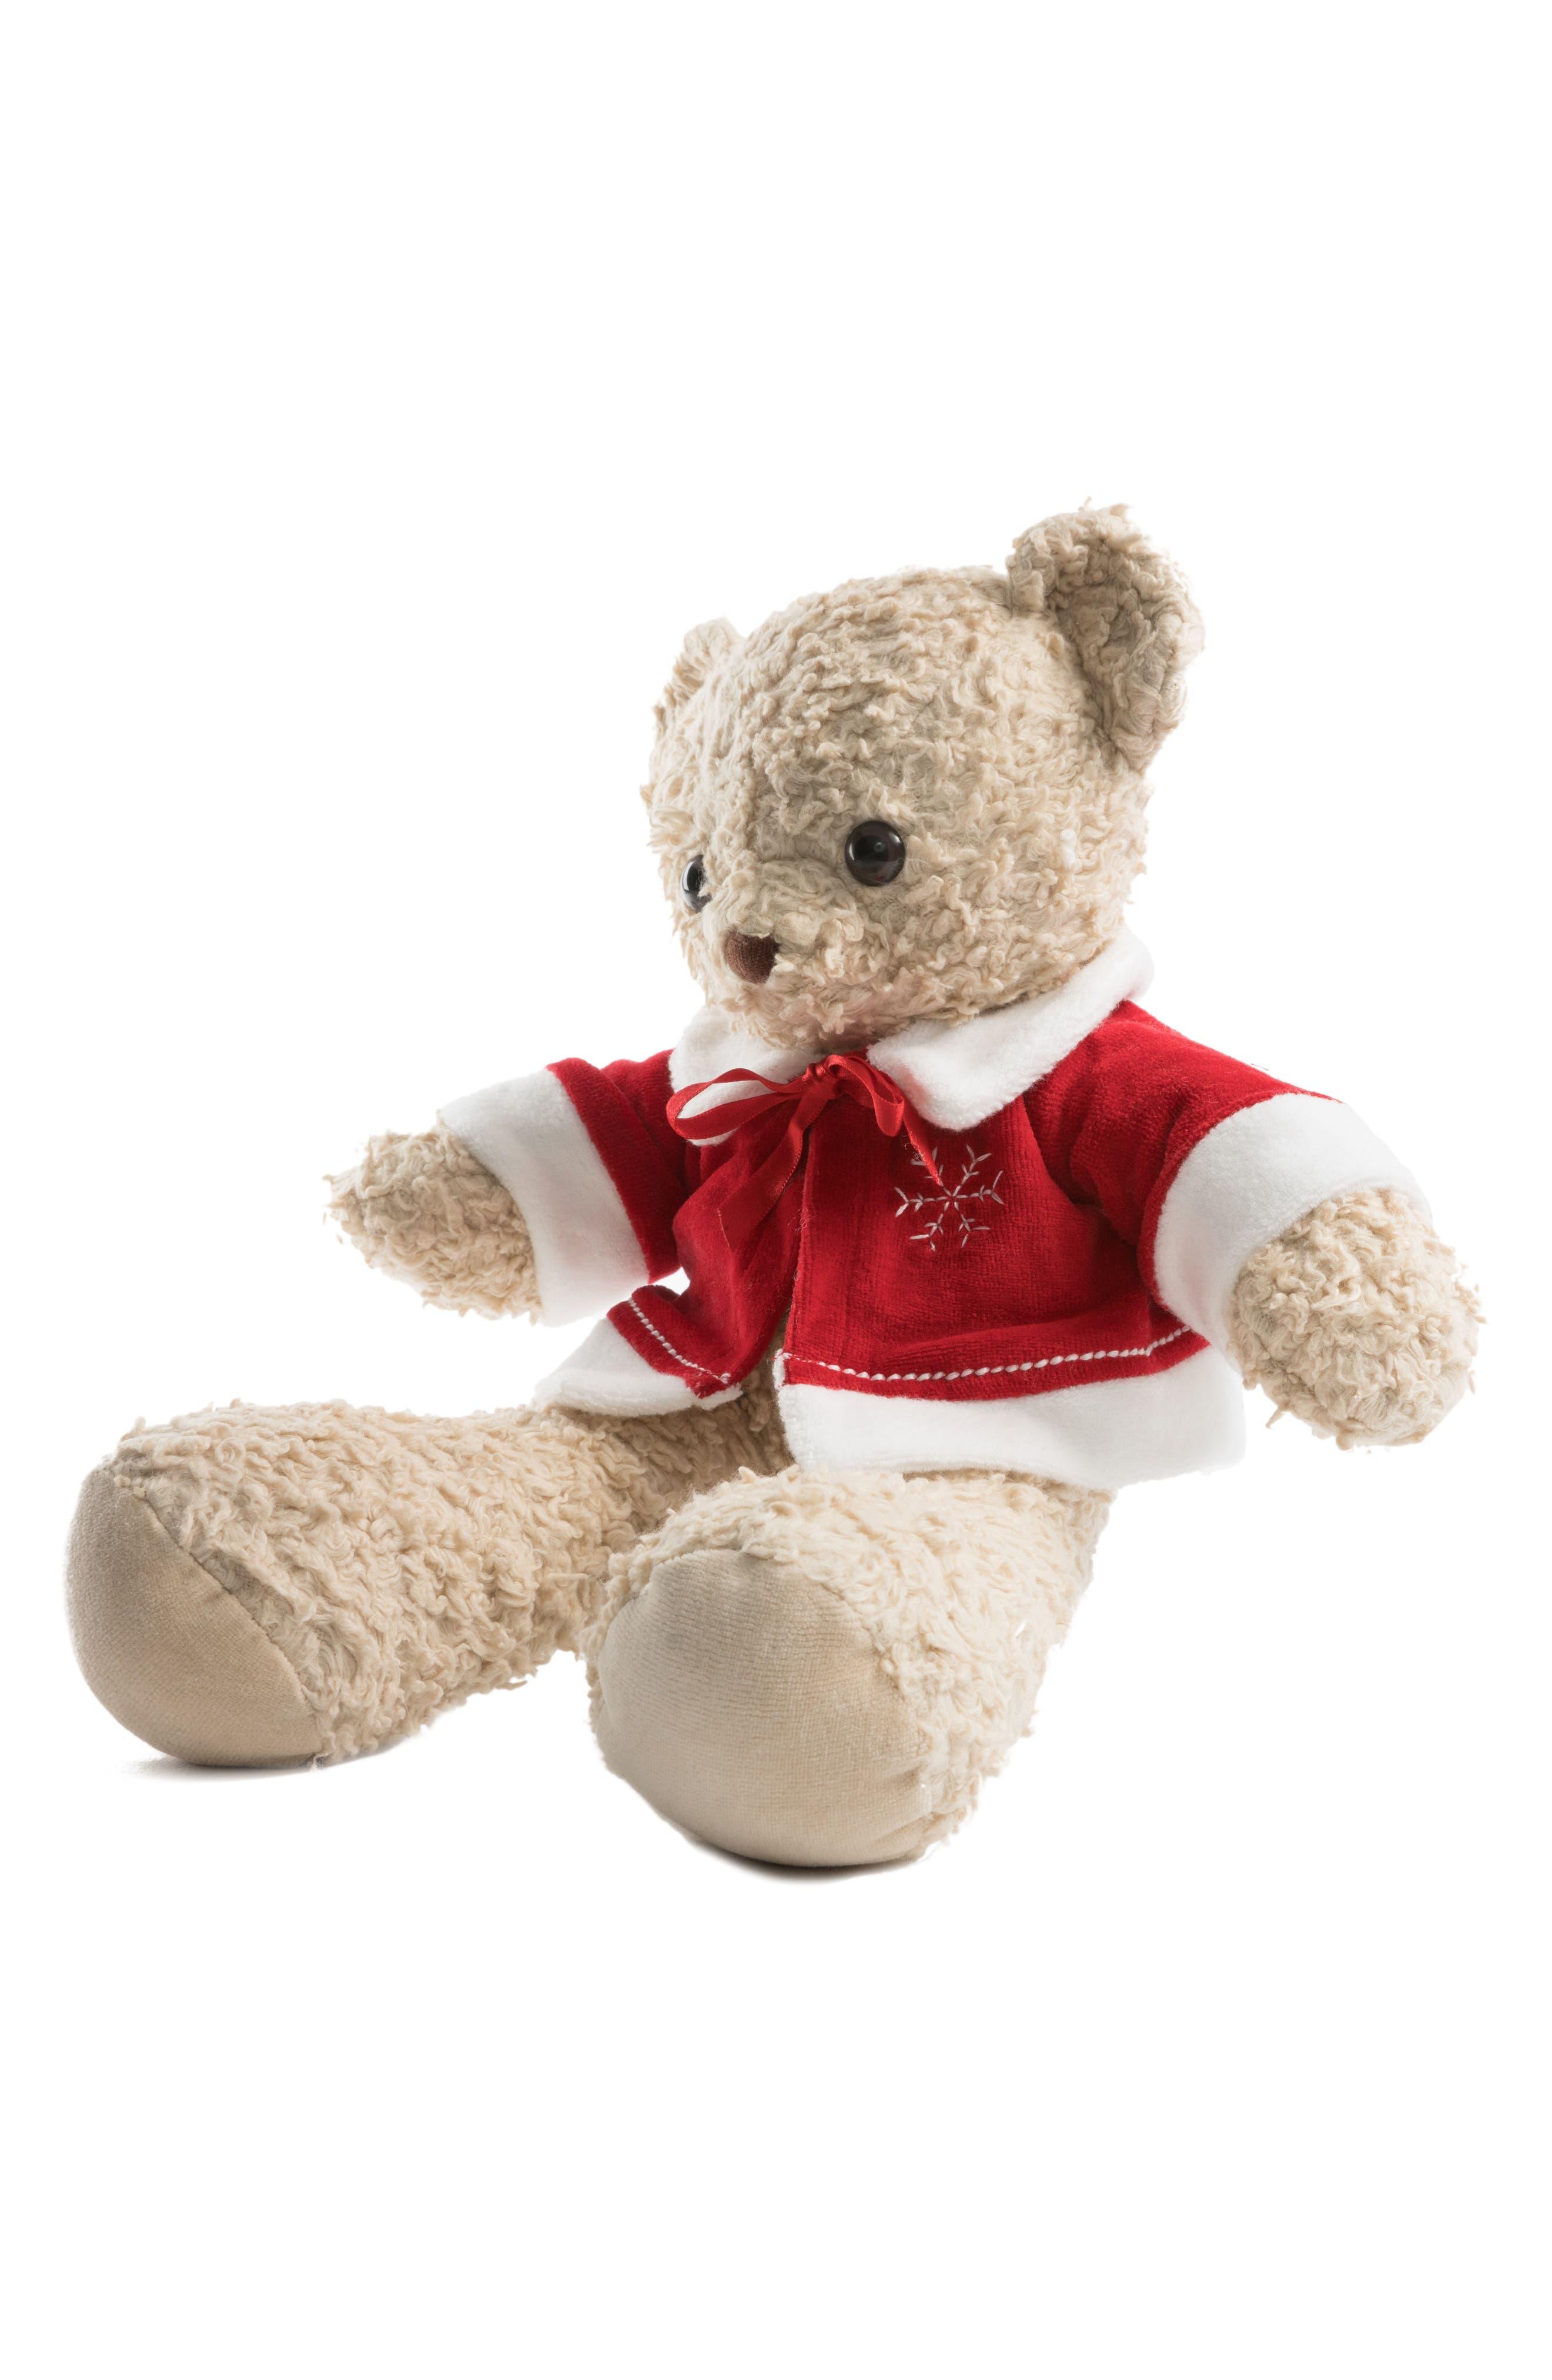 Medium Stuffed Bear with Holiday Jacket,                             Alternate thumbnail 9, color,